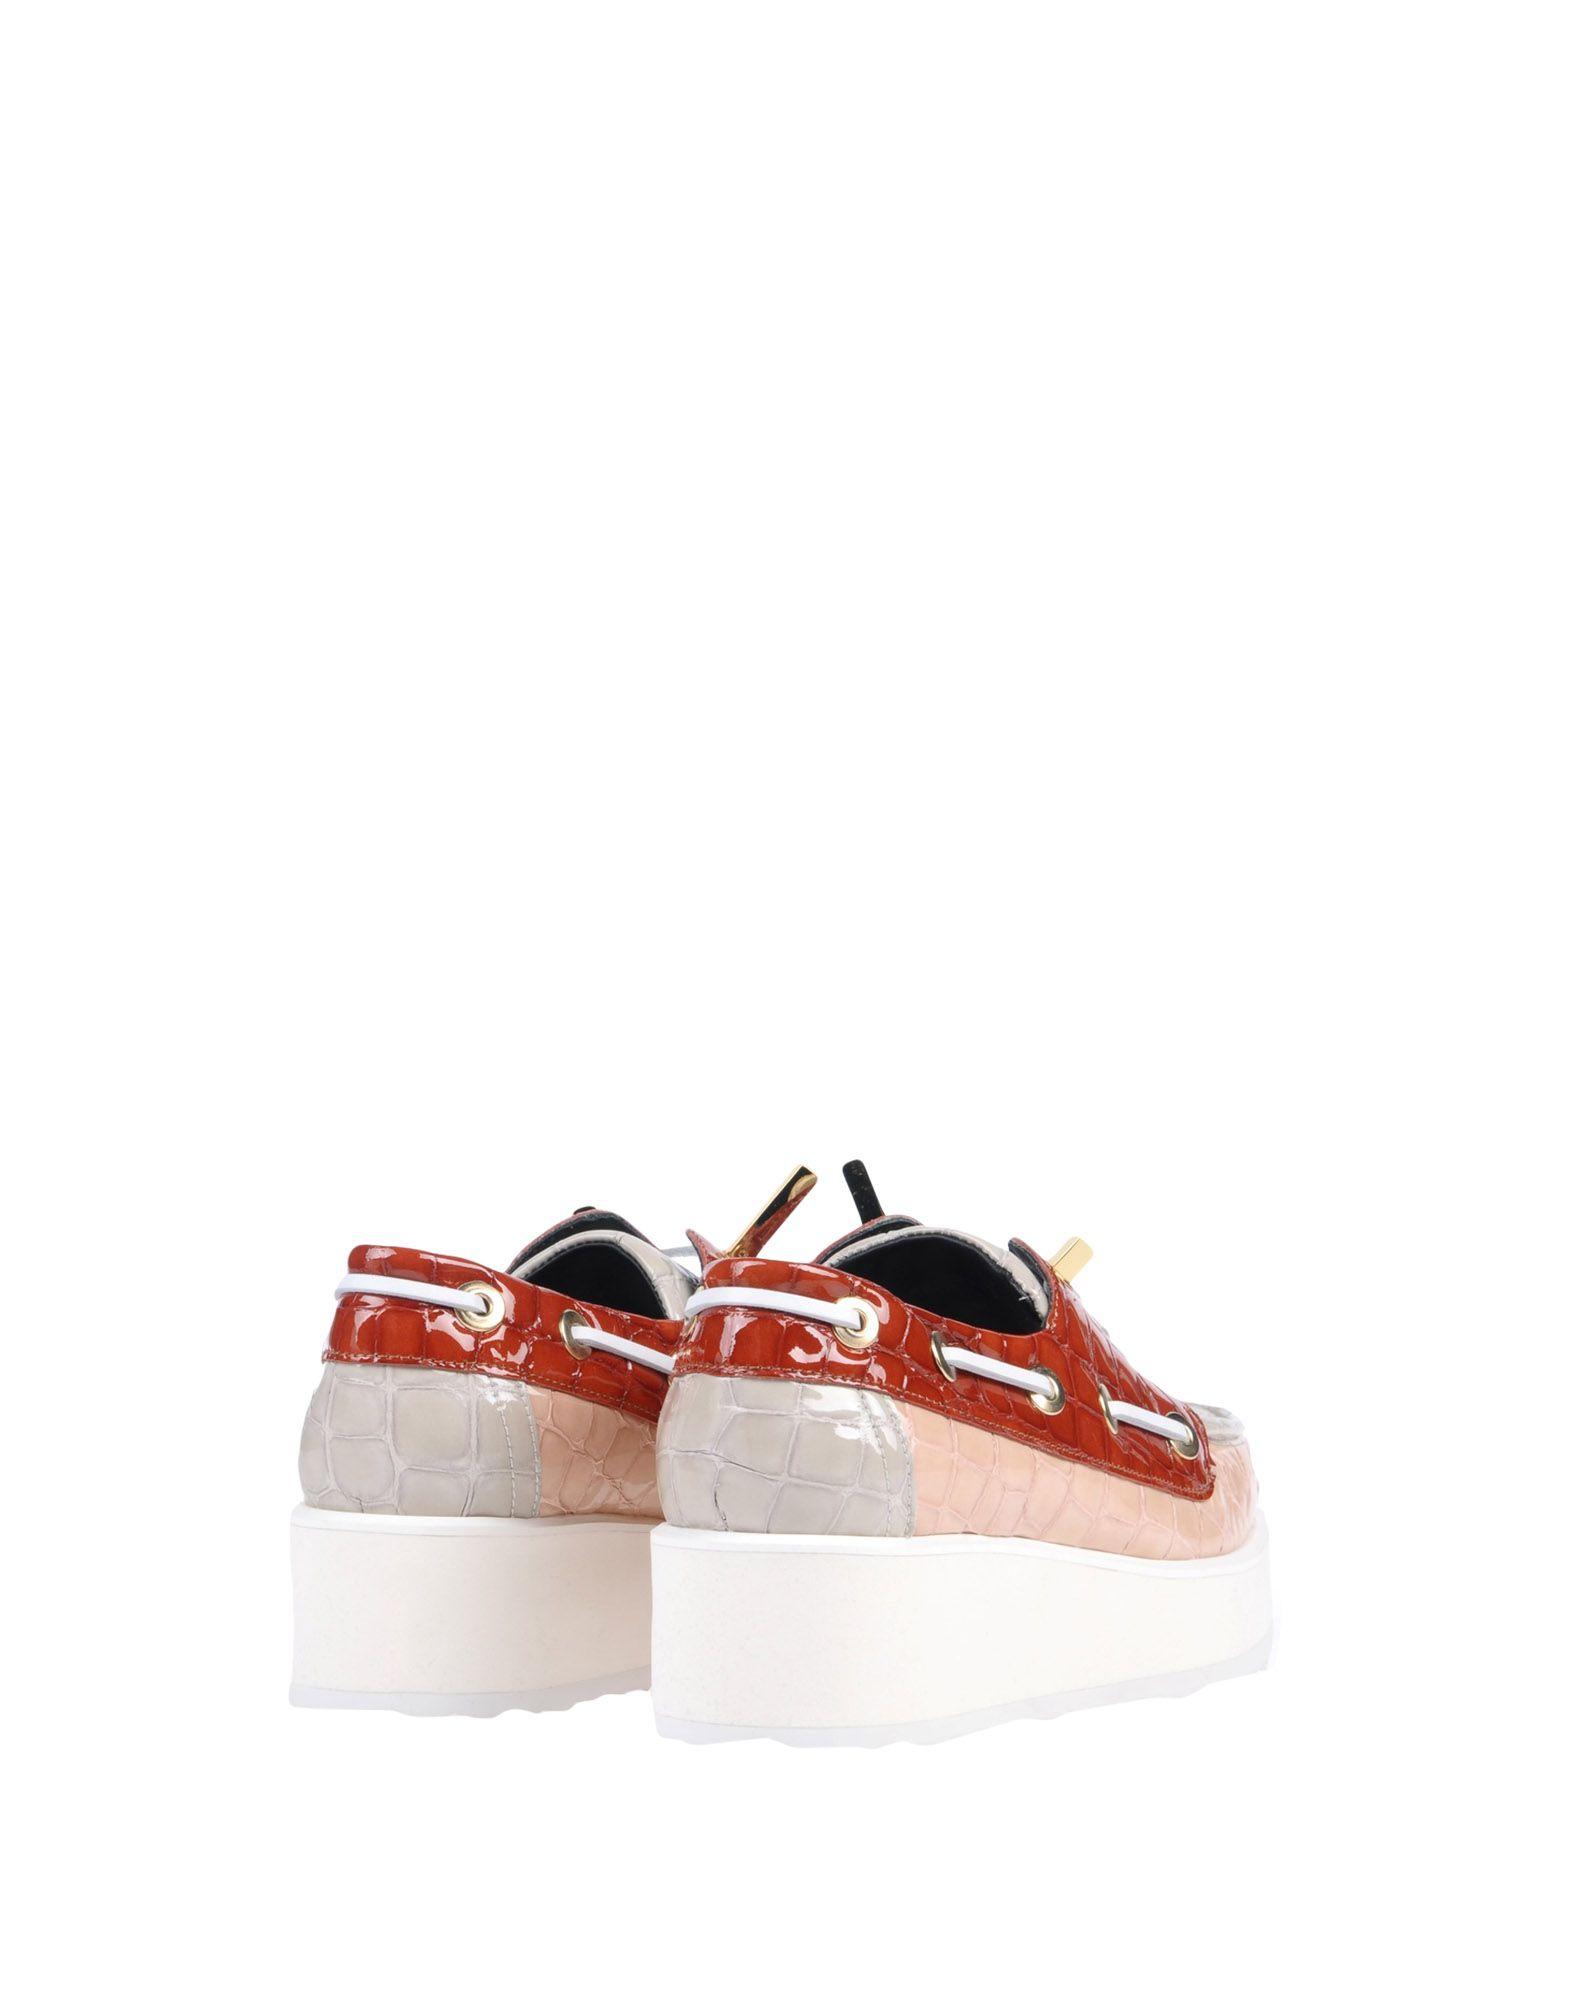 Chaussures À Lacets Pierre Hardy Femme - Chaussures À Lacets Pierre Hardy sur